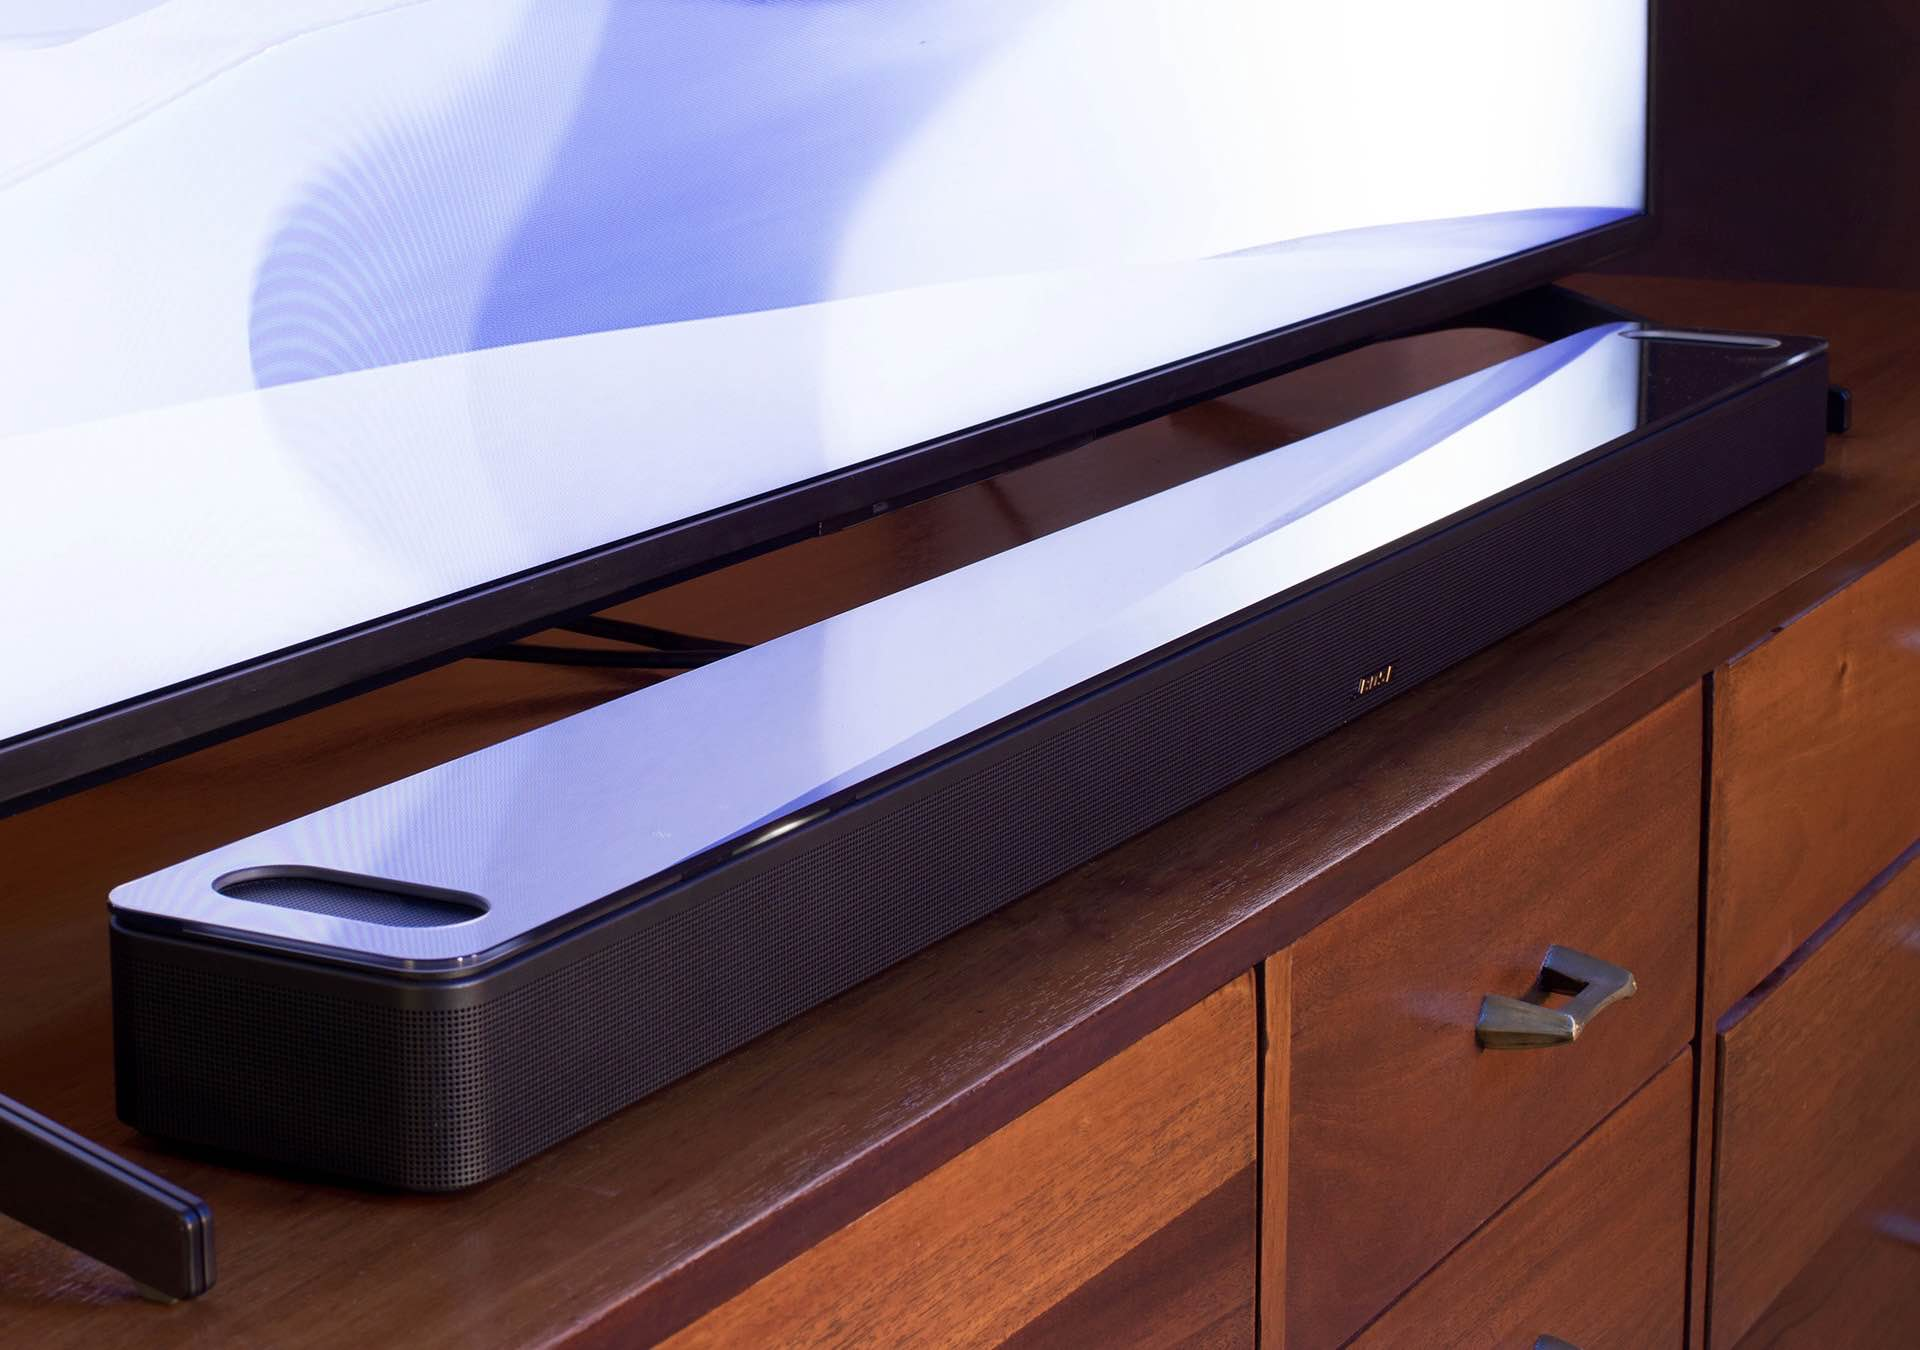 bose-smart-soundbar-900-black